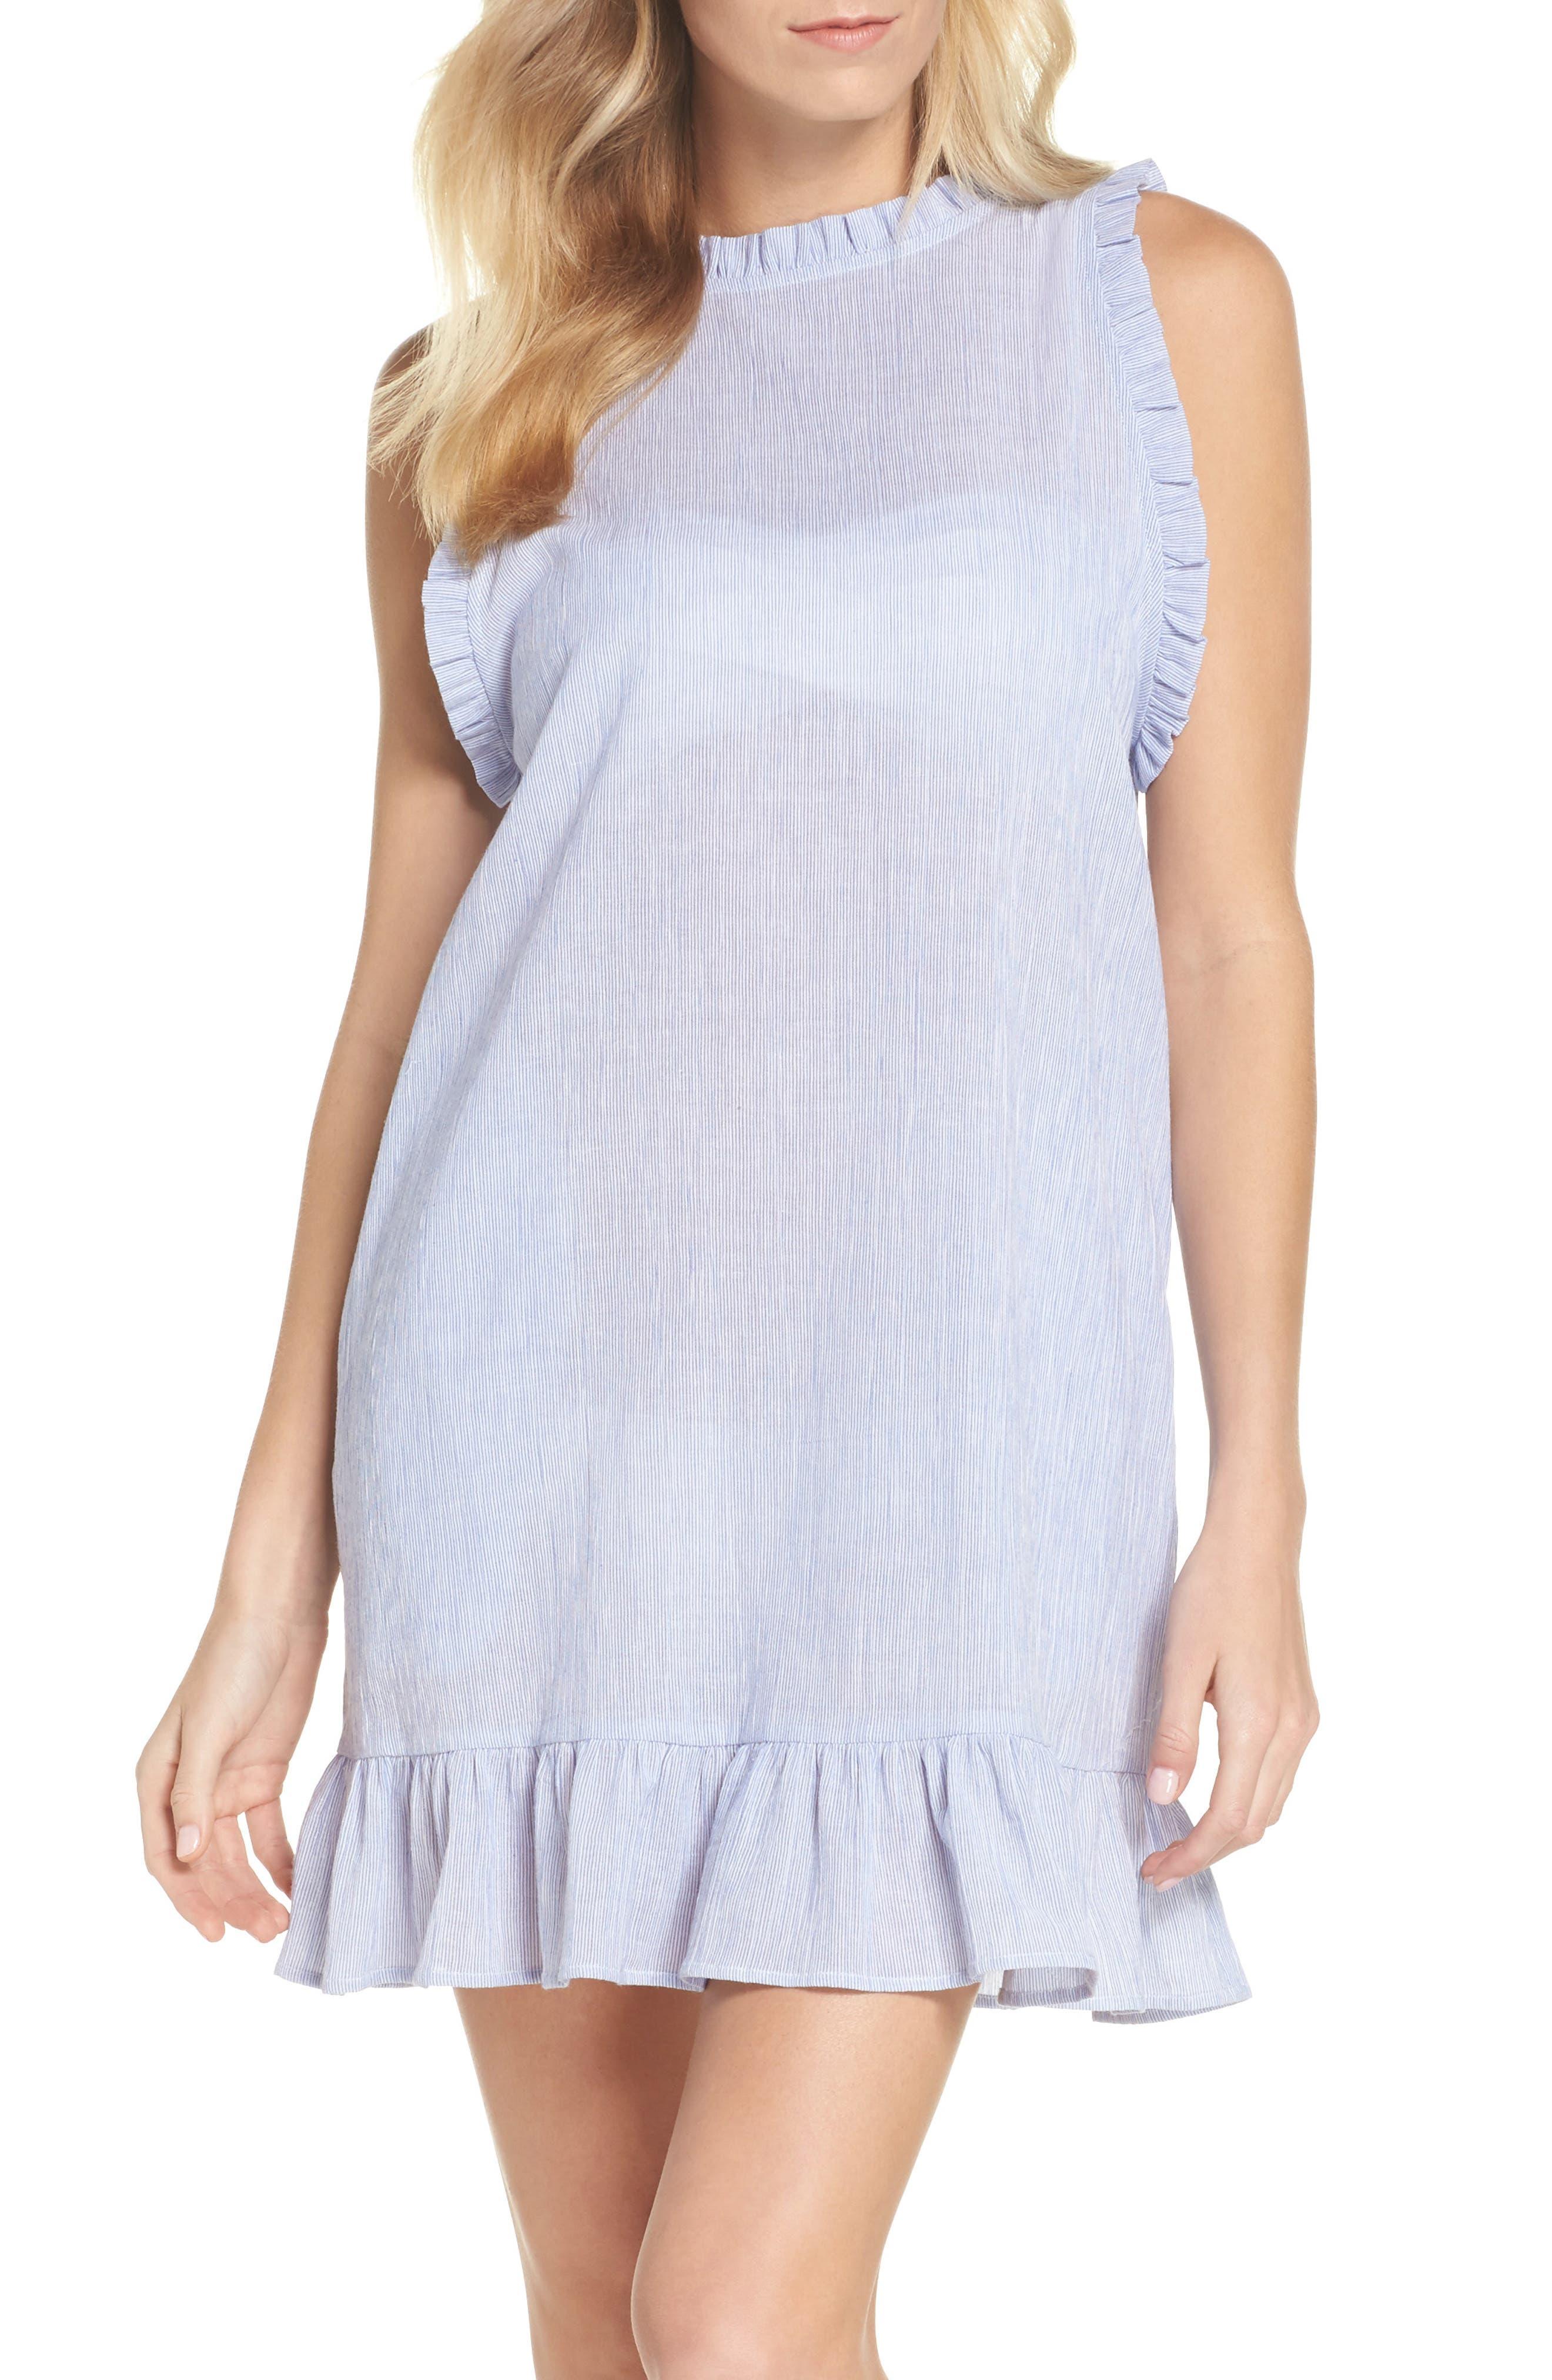 Heidi Cover-Up Dress,                         Main,                         color, Blue/ White